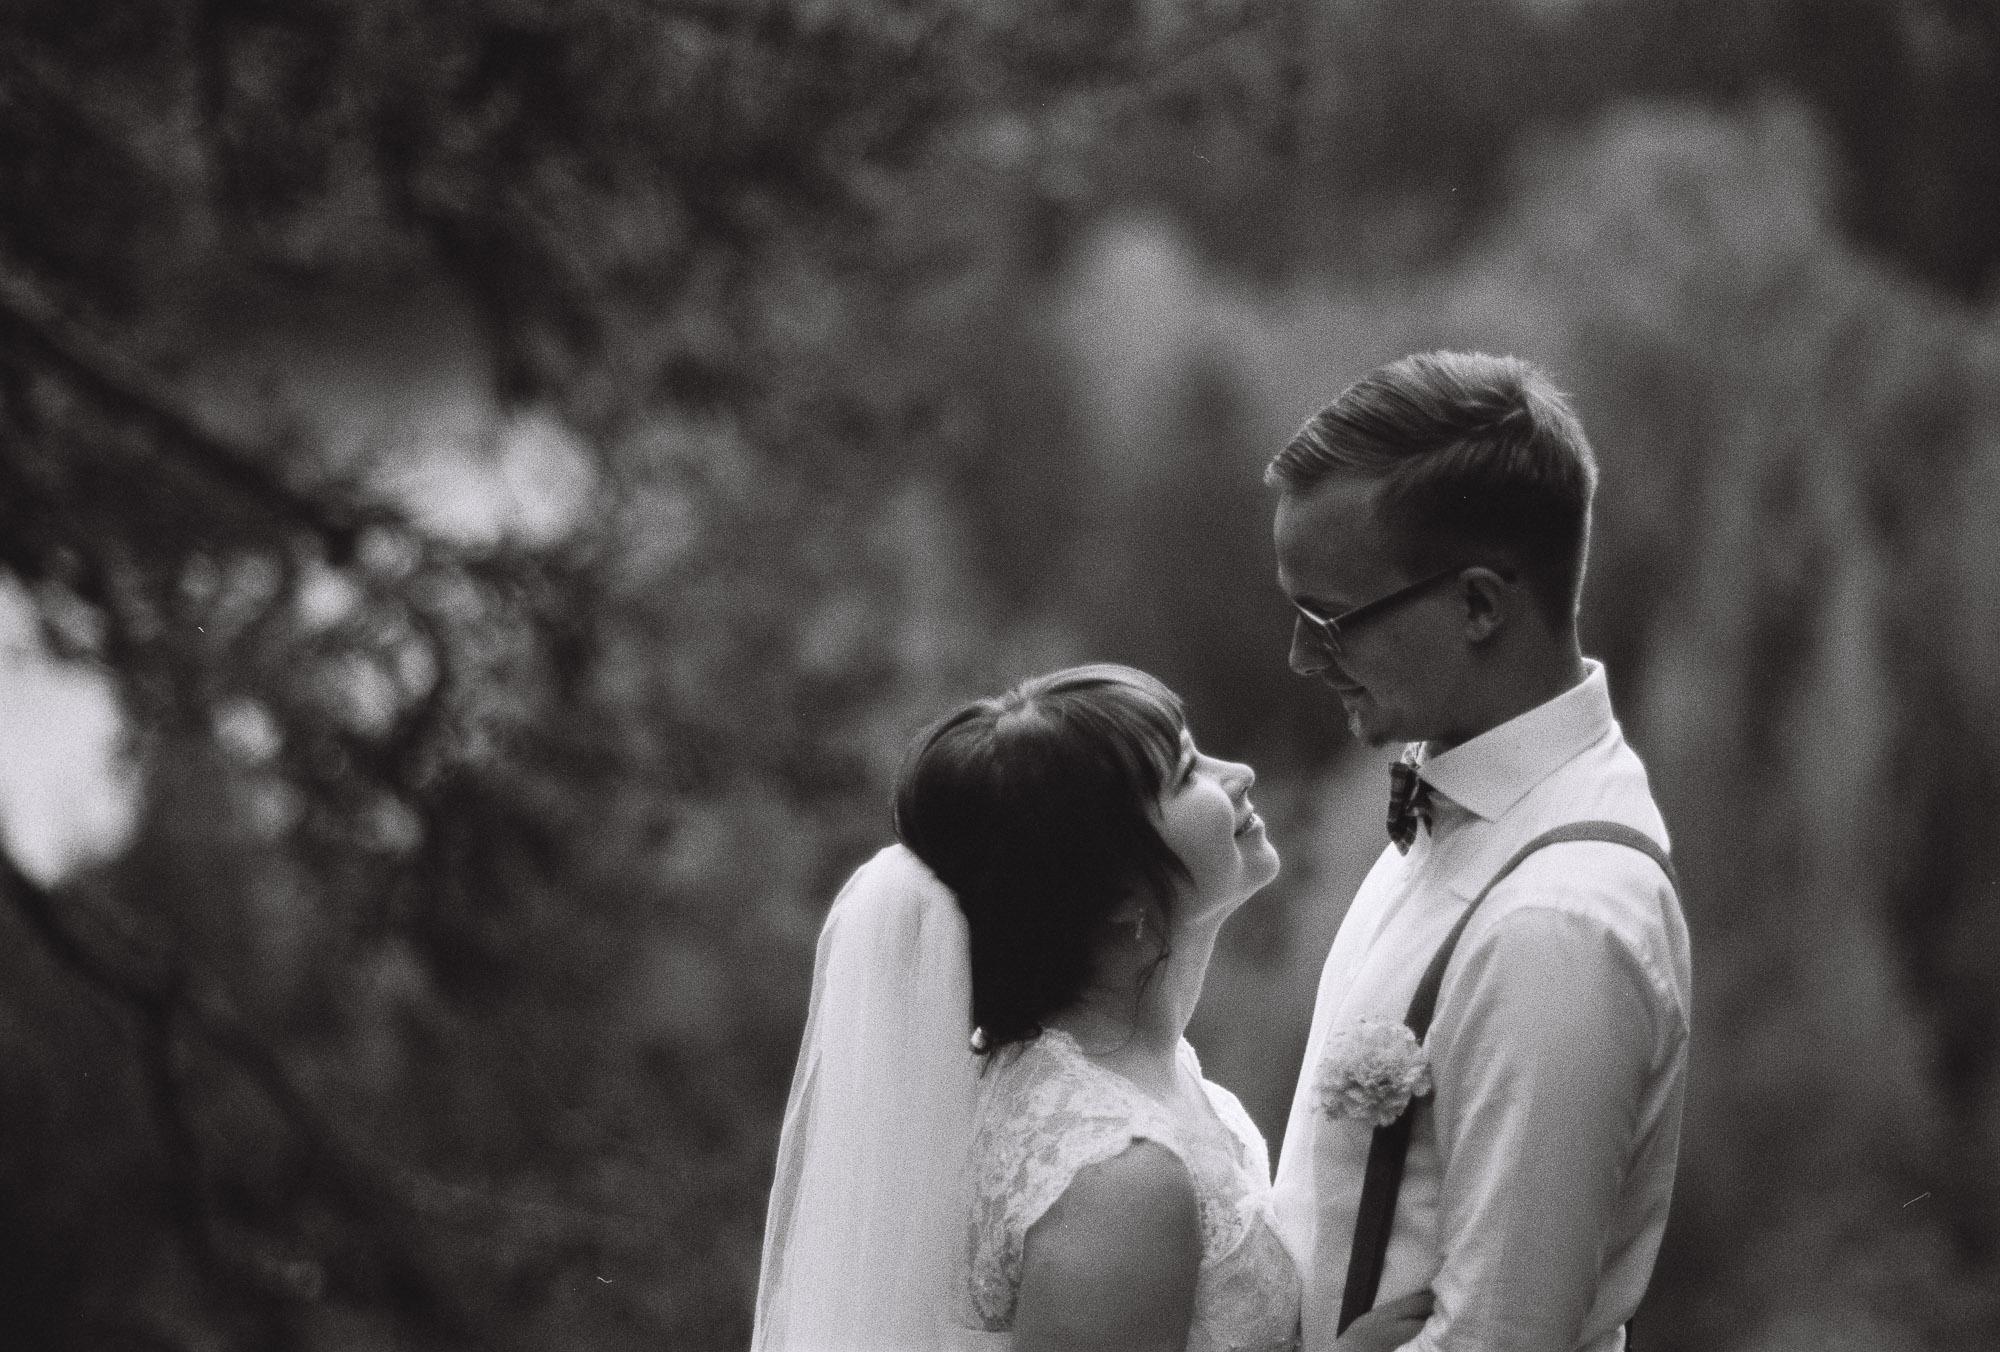 jere-satamo-analog-film-wedding-photographer-finland-129.jpg